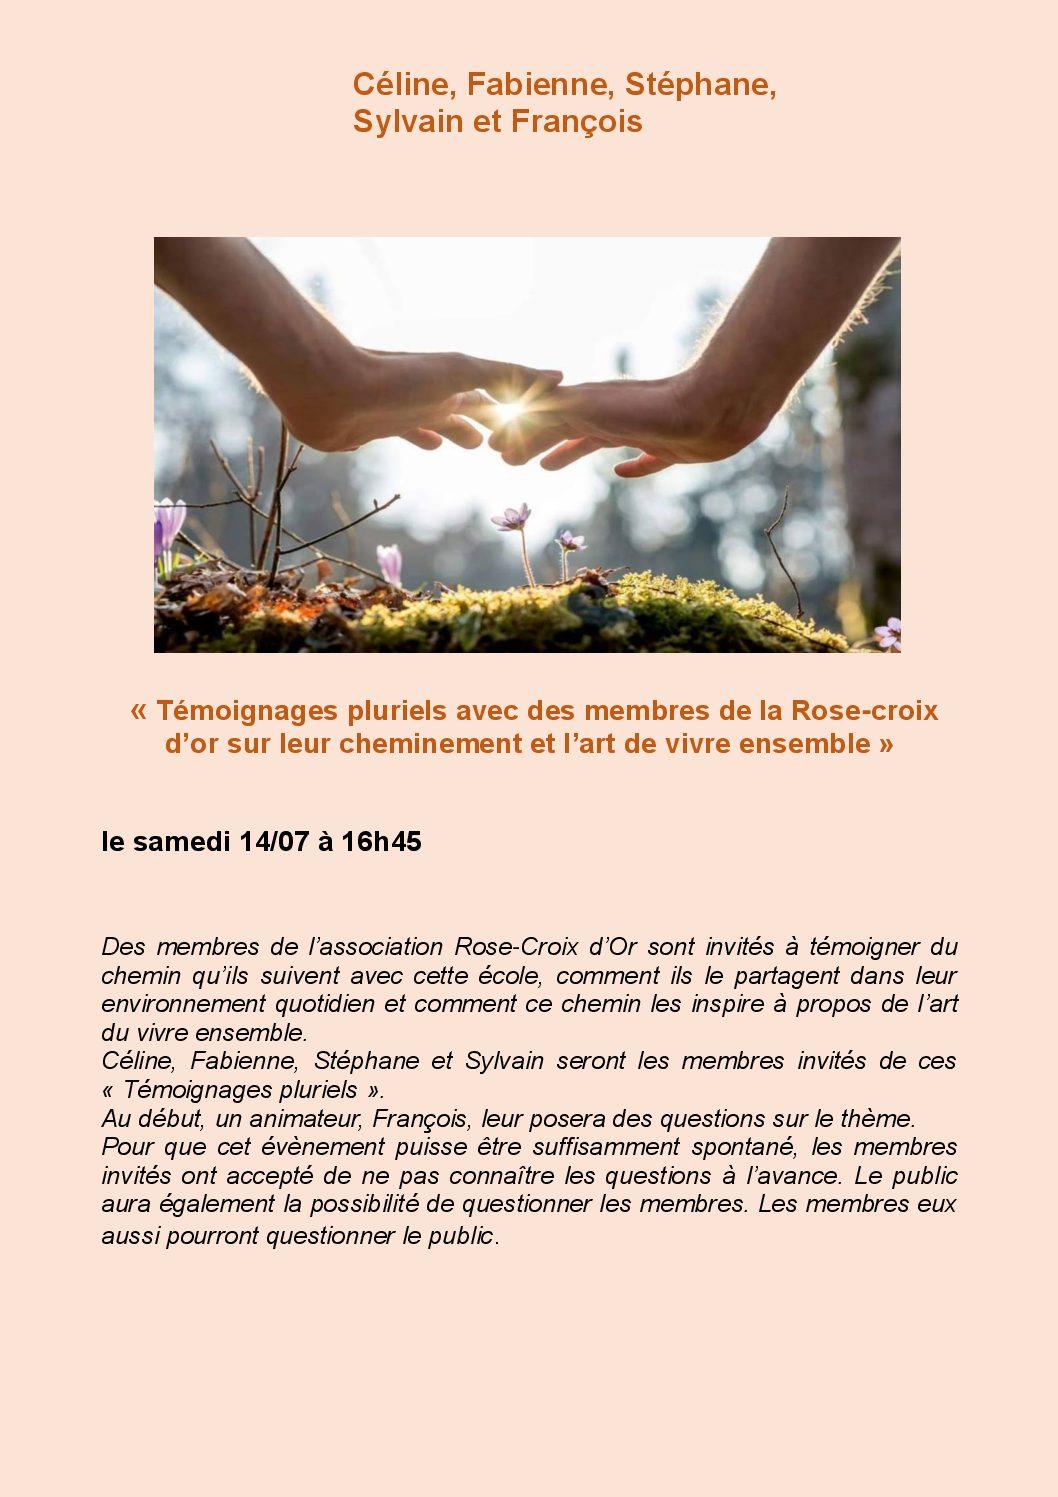 Temoignages Pluriels Rose Croix D Or Fonds Rose Croix